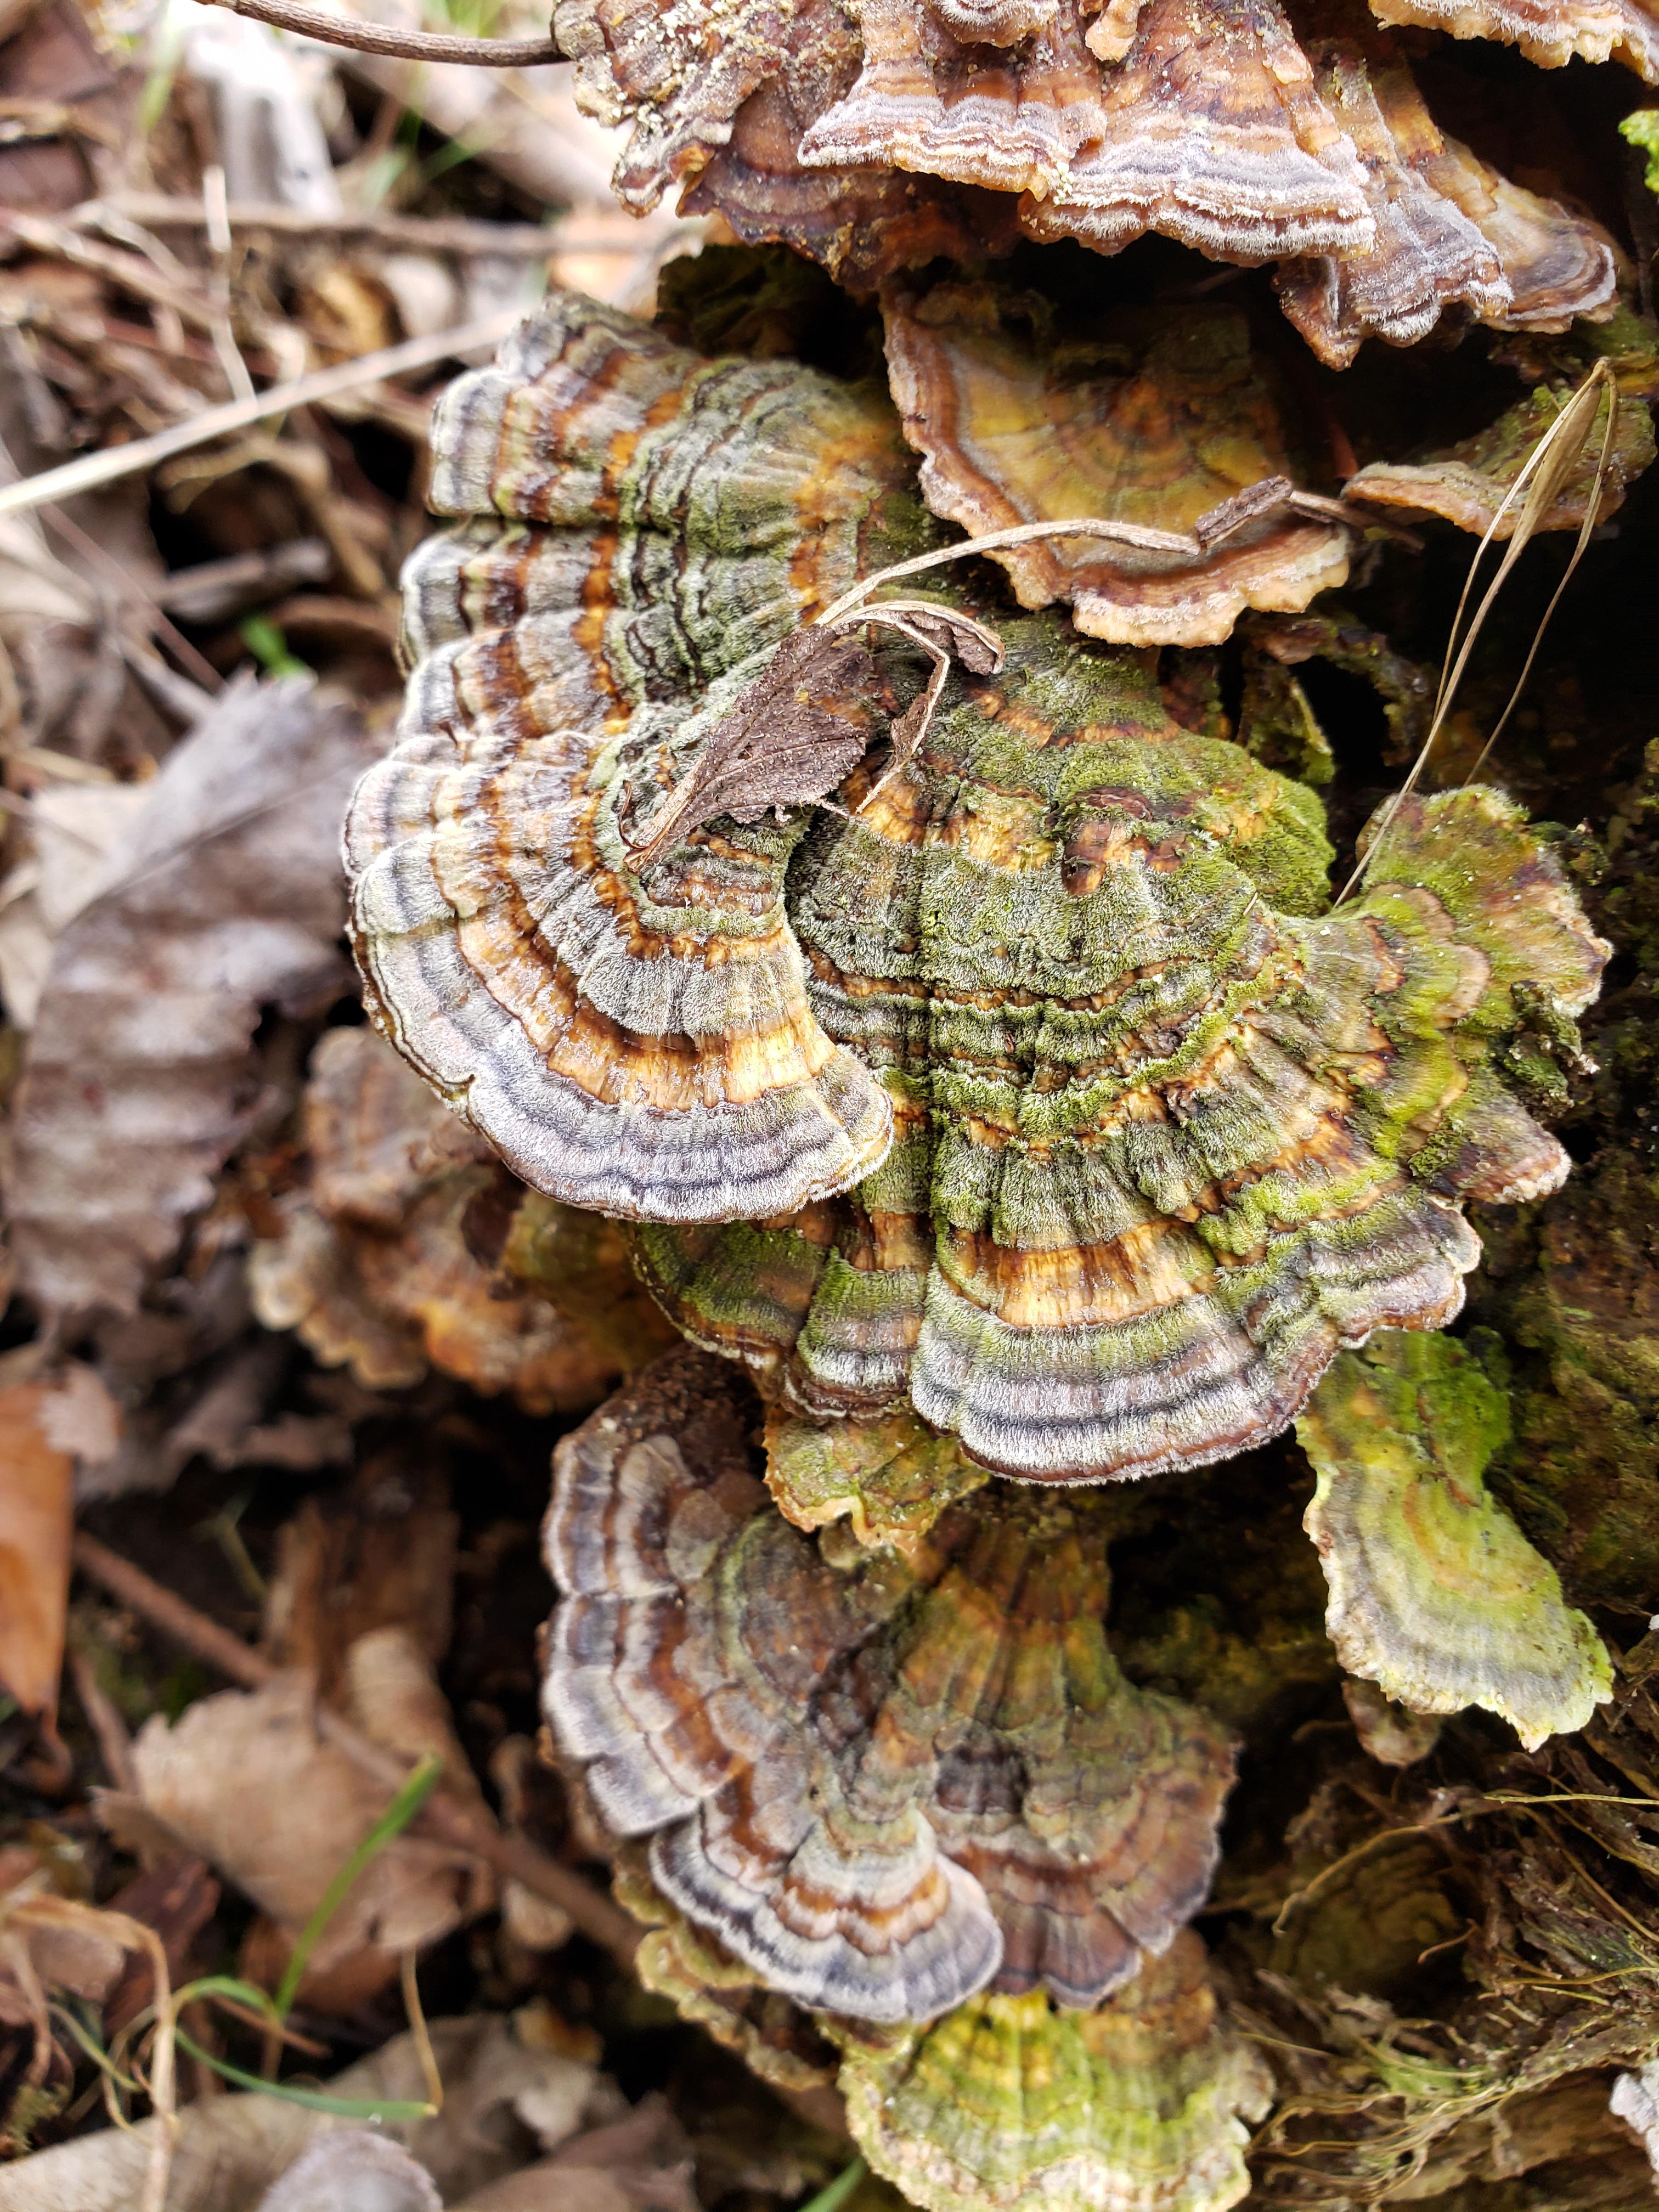 What seems to be a turkey tail mushroom I found hiking ...